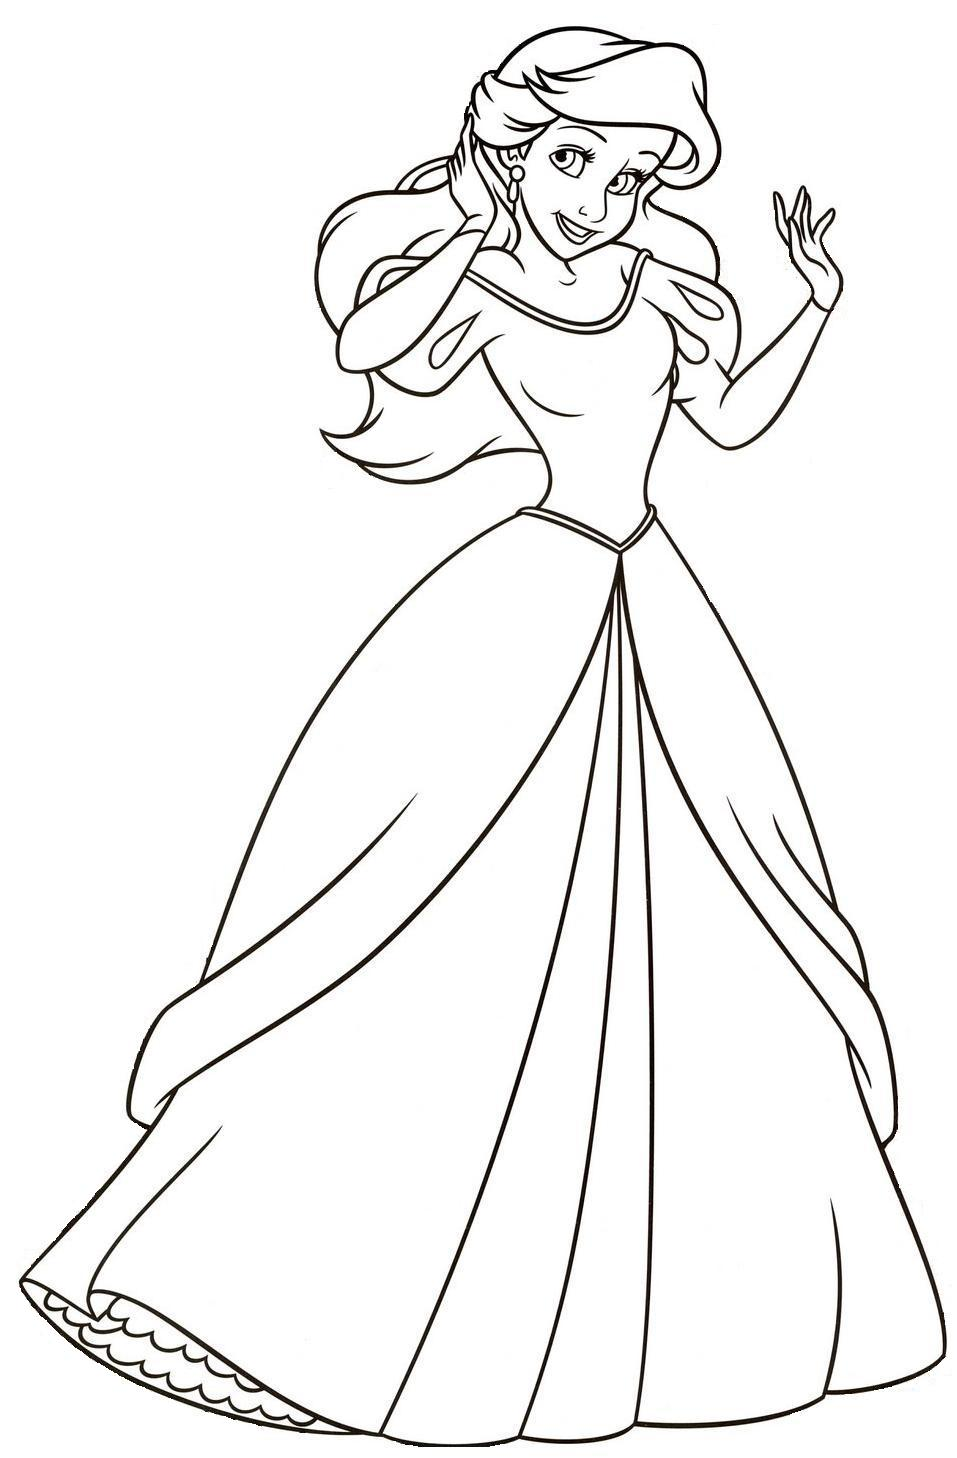 Único Princesa Disney Para Colorear Ariel Inspiración - Dibujos Para ...